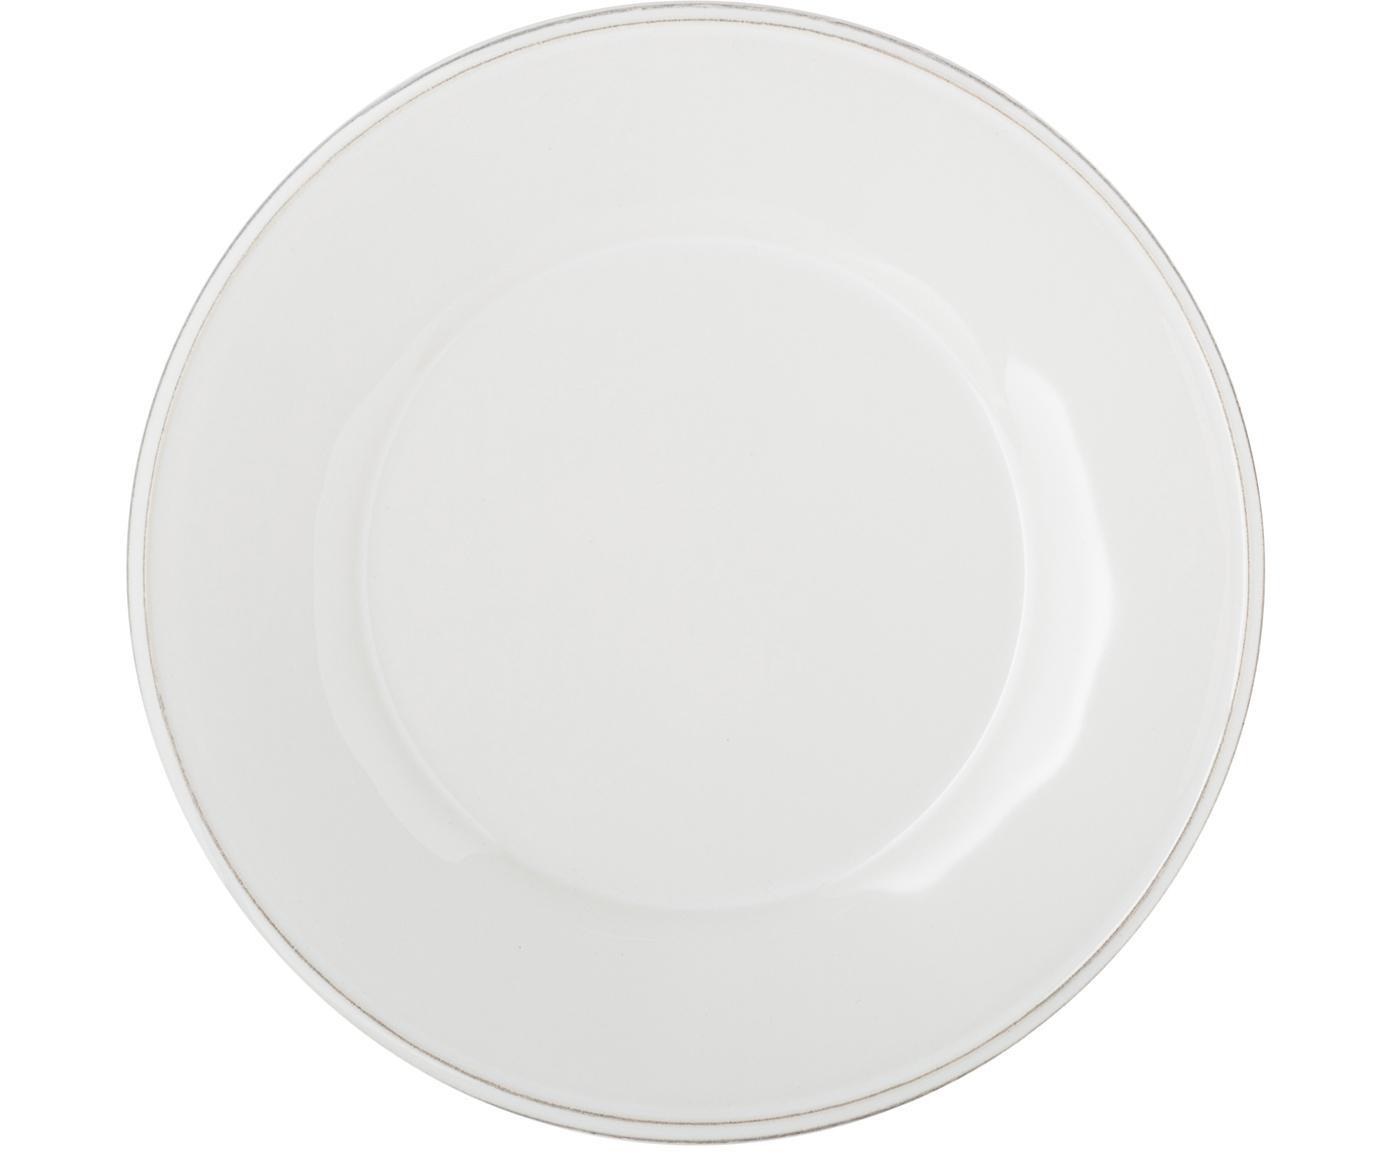 Piatto da colazione bianco Constance 2 pz, Ceramica, Bianco, Ø 24 cm